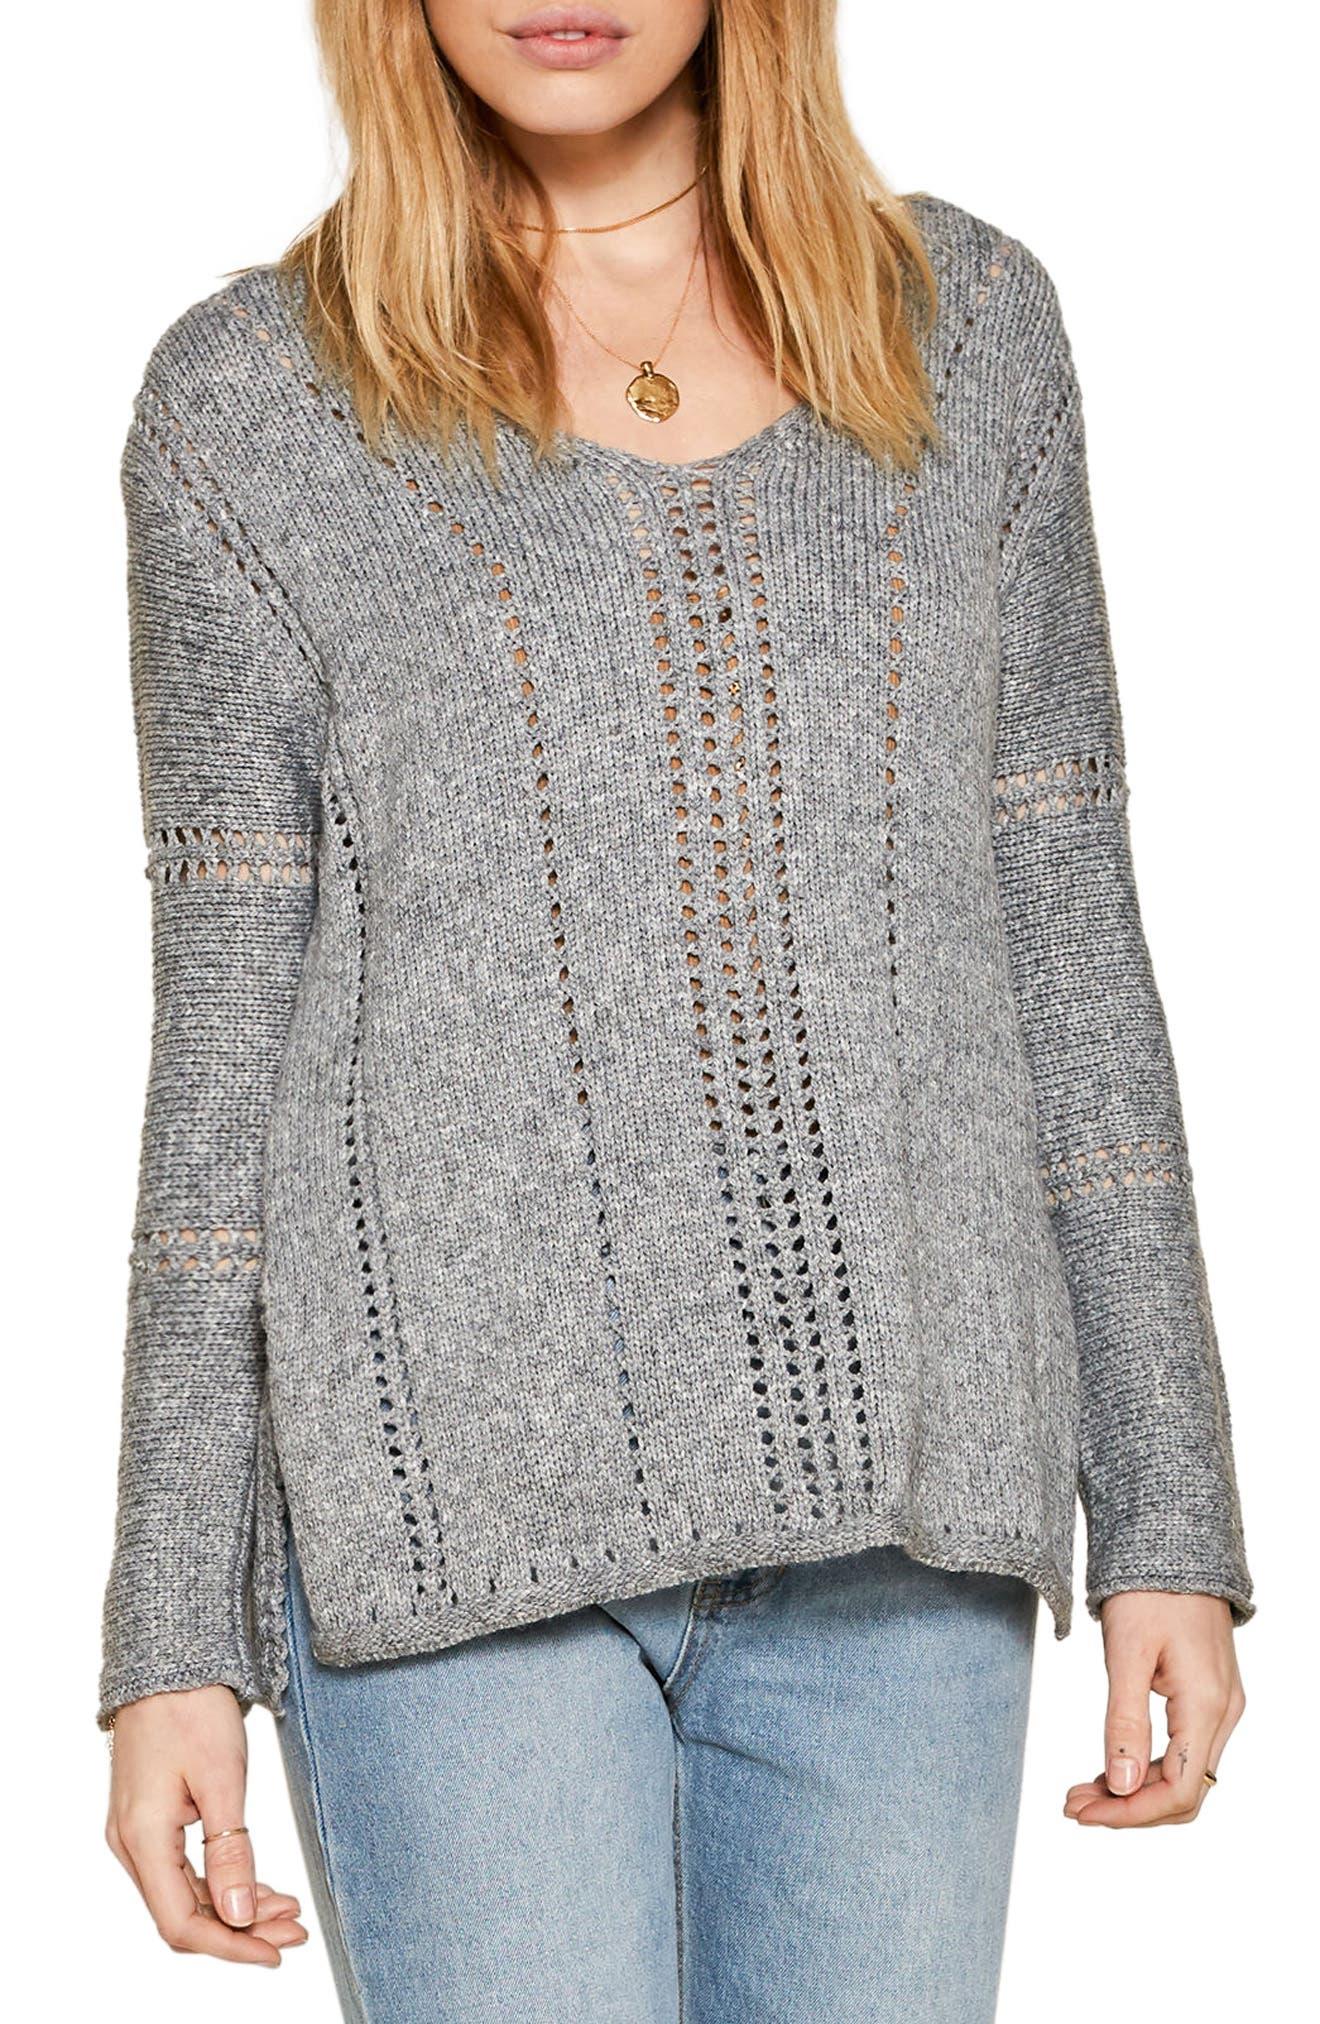 Amuse Society Rickerson Sweater